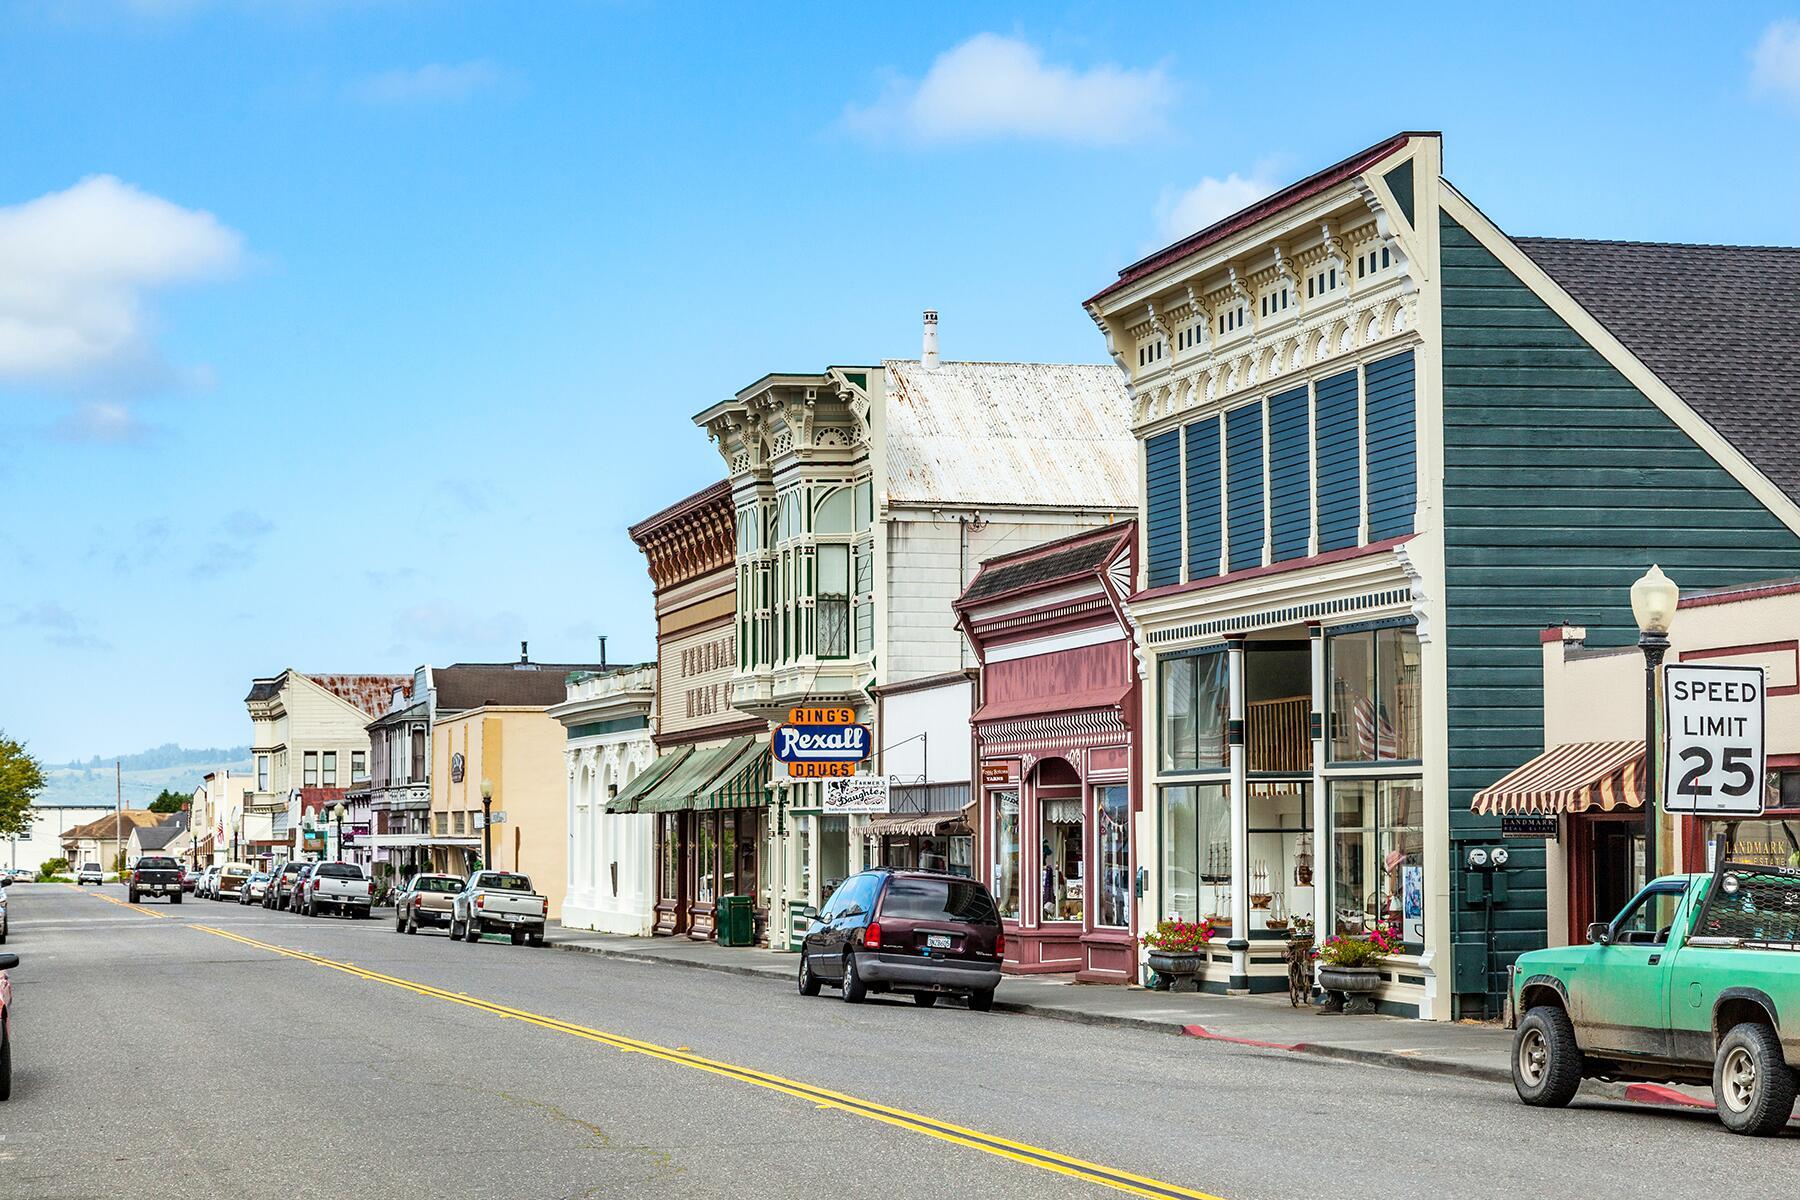 Mendocino to Eureka, California